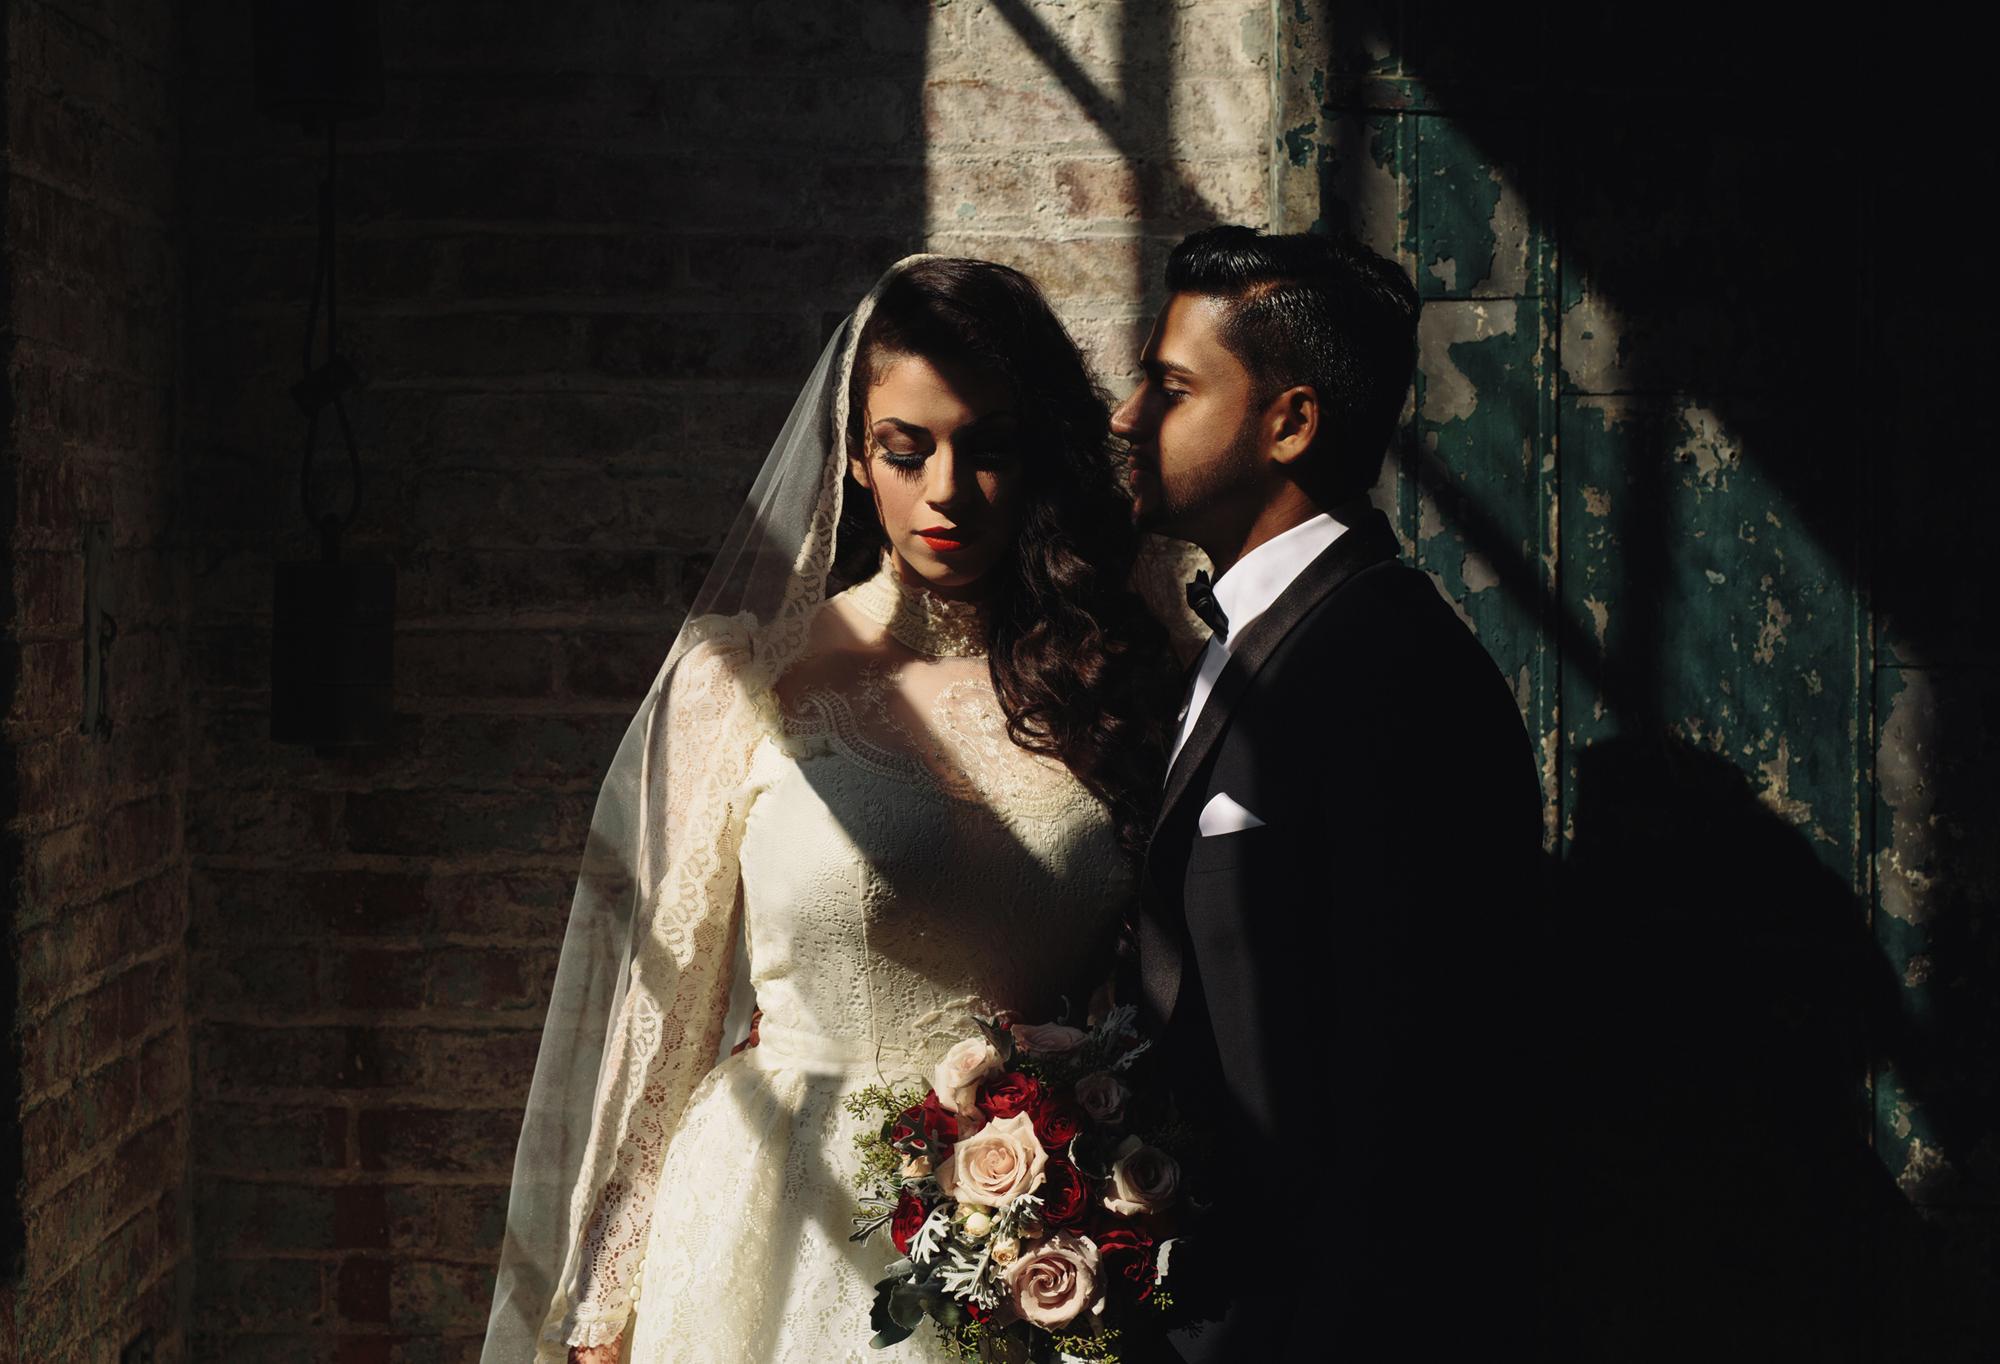 SSP-9513_themetropolitanbuilding_nyc_wedding_web.jpg